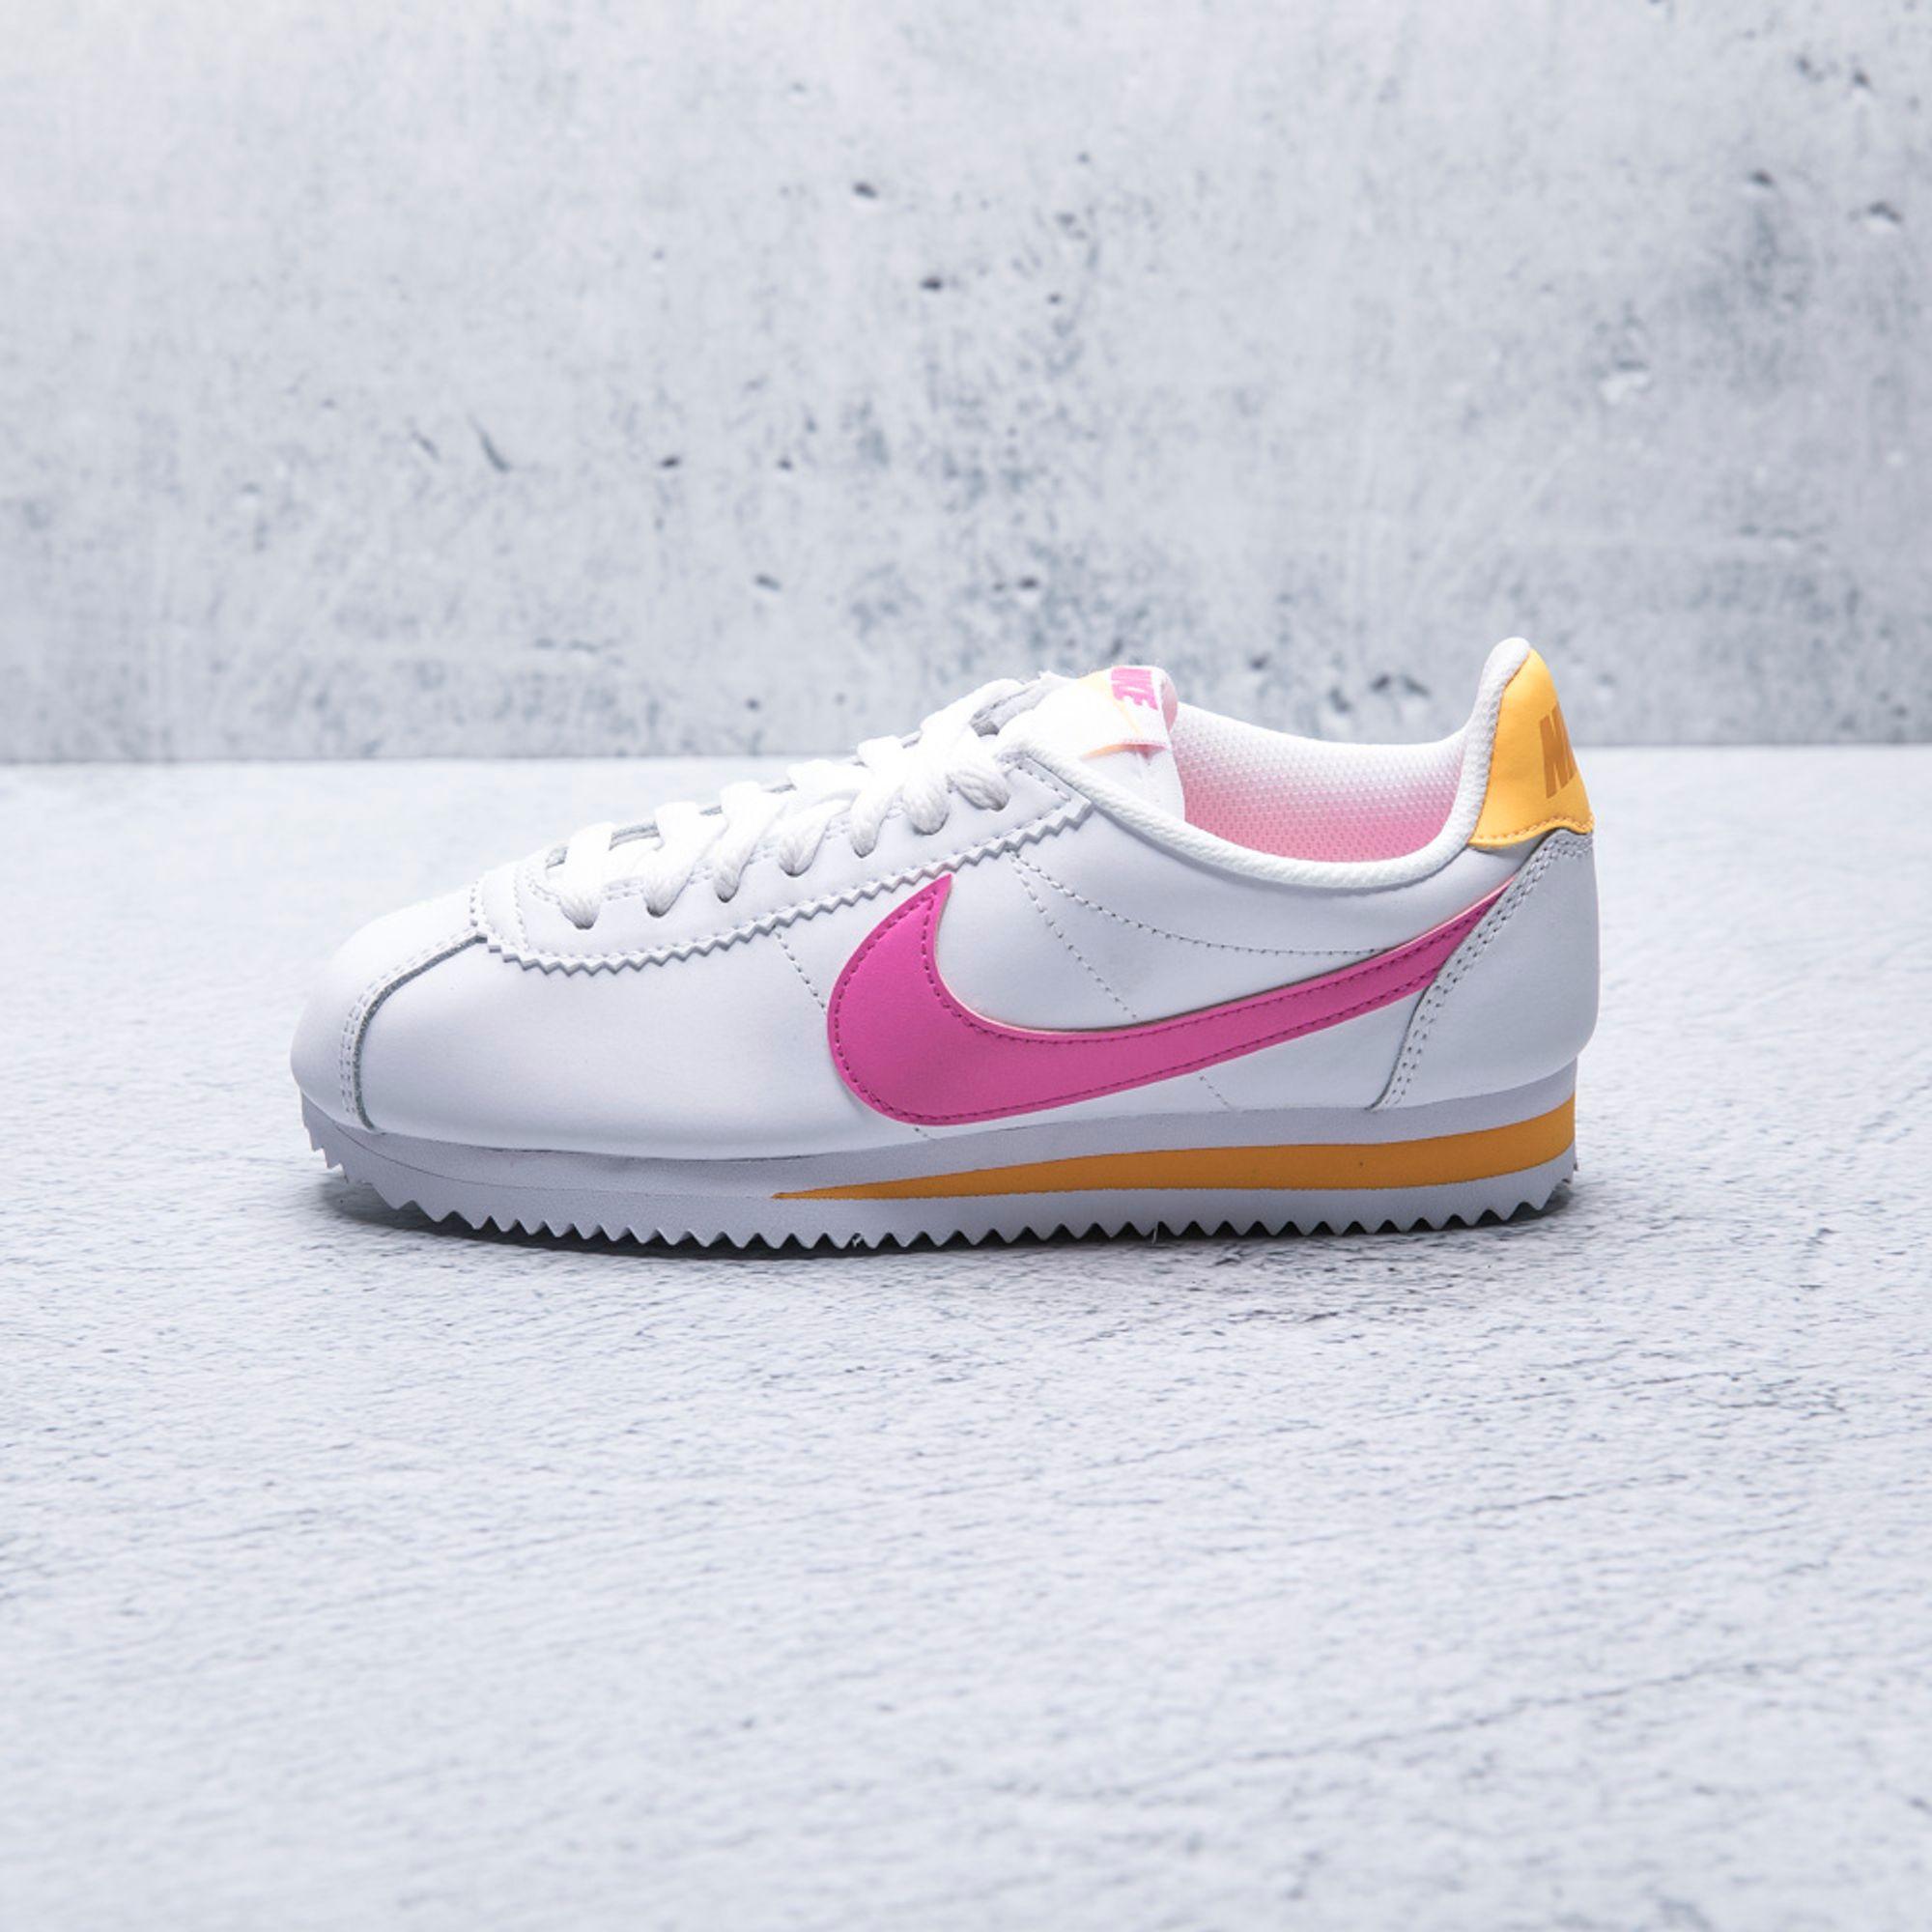 Tenis Nike Mujer 807471-112 CORTEZ - agaval